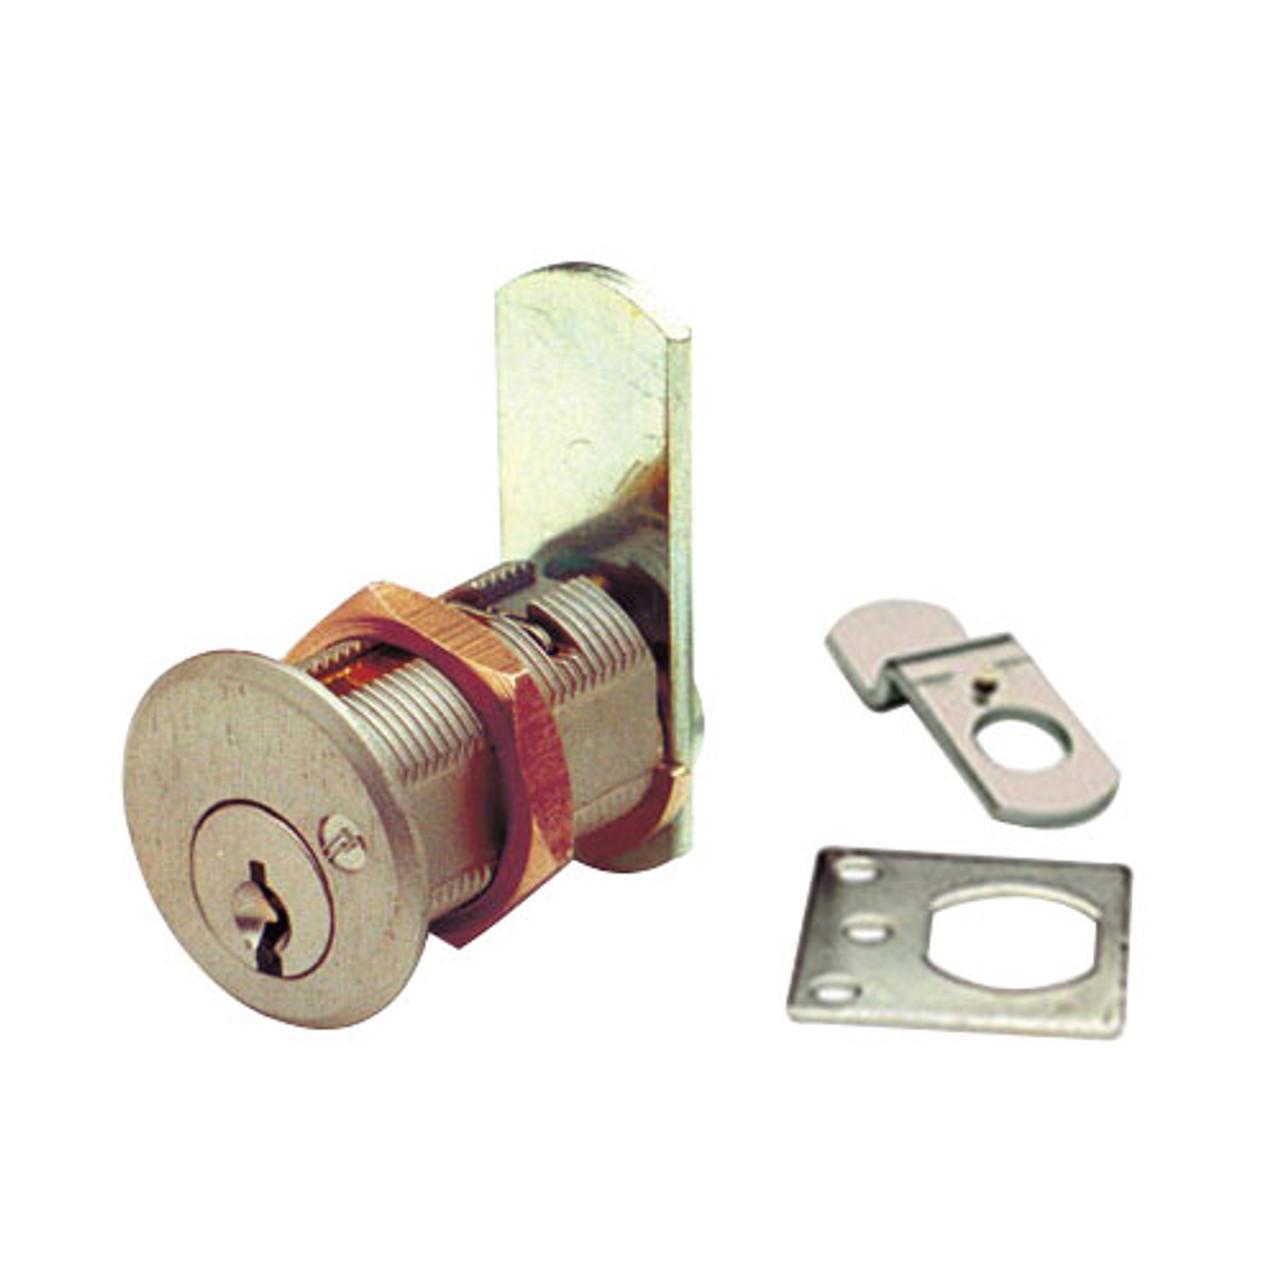 Olympus DCN1-KA101-US3 Cam Locks in Bright Brass Finish